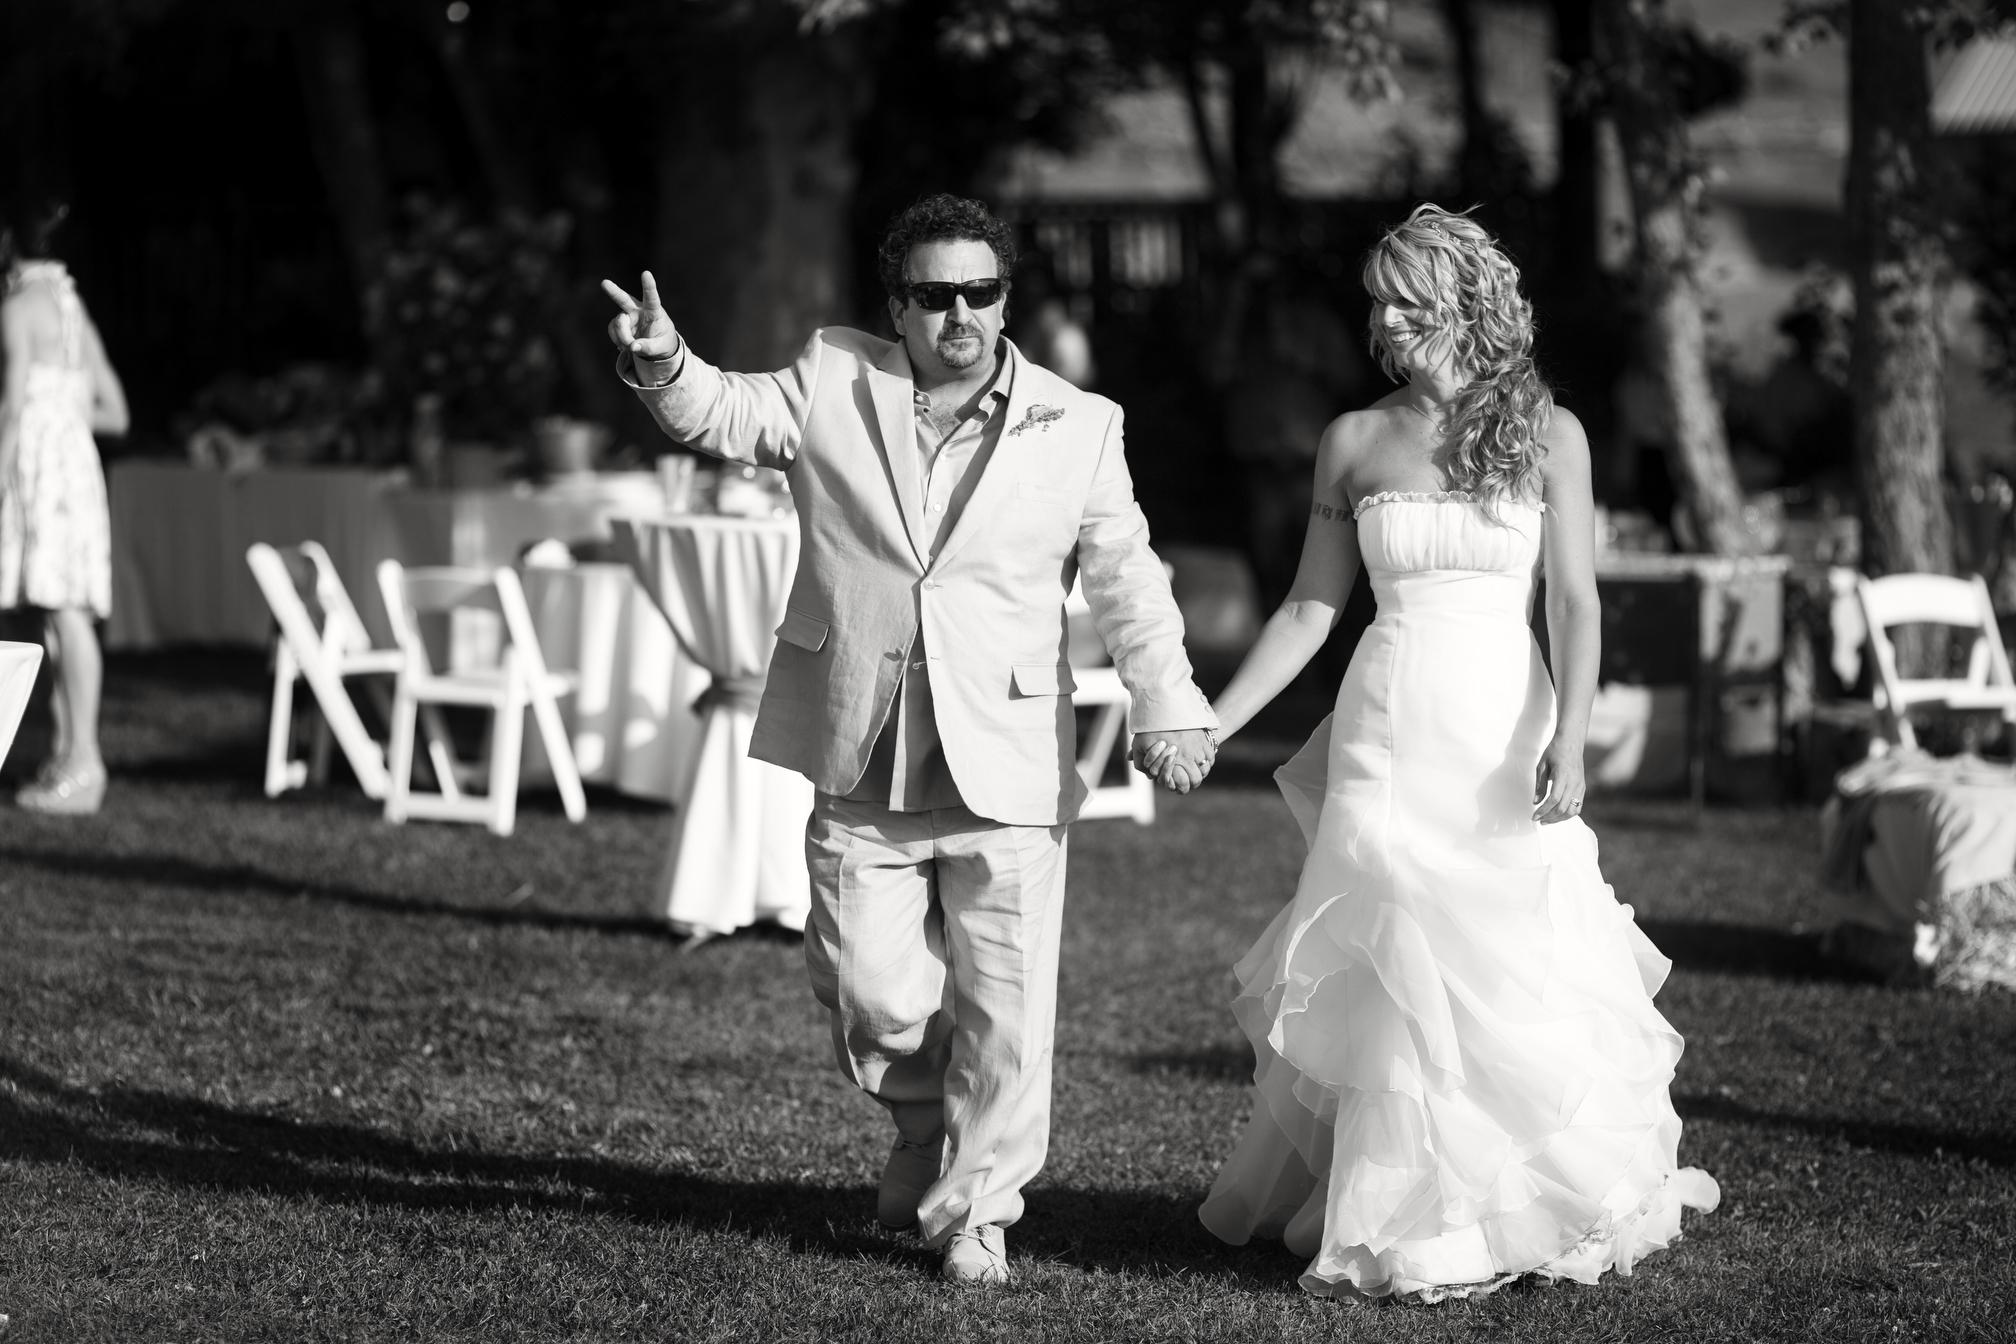 Fishman Wedding Jackson Hole 2012_1147.JPG